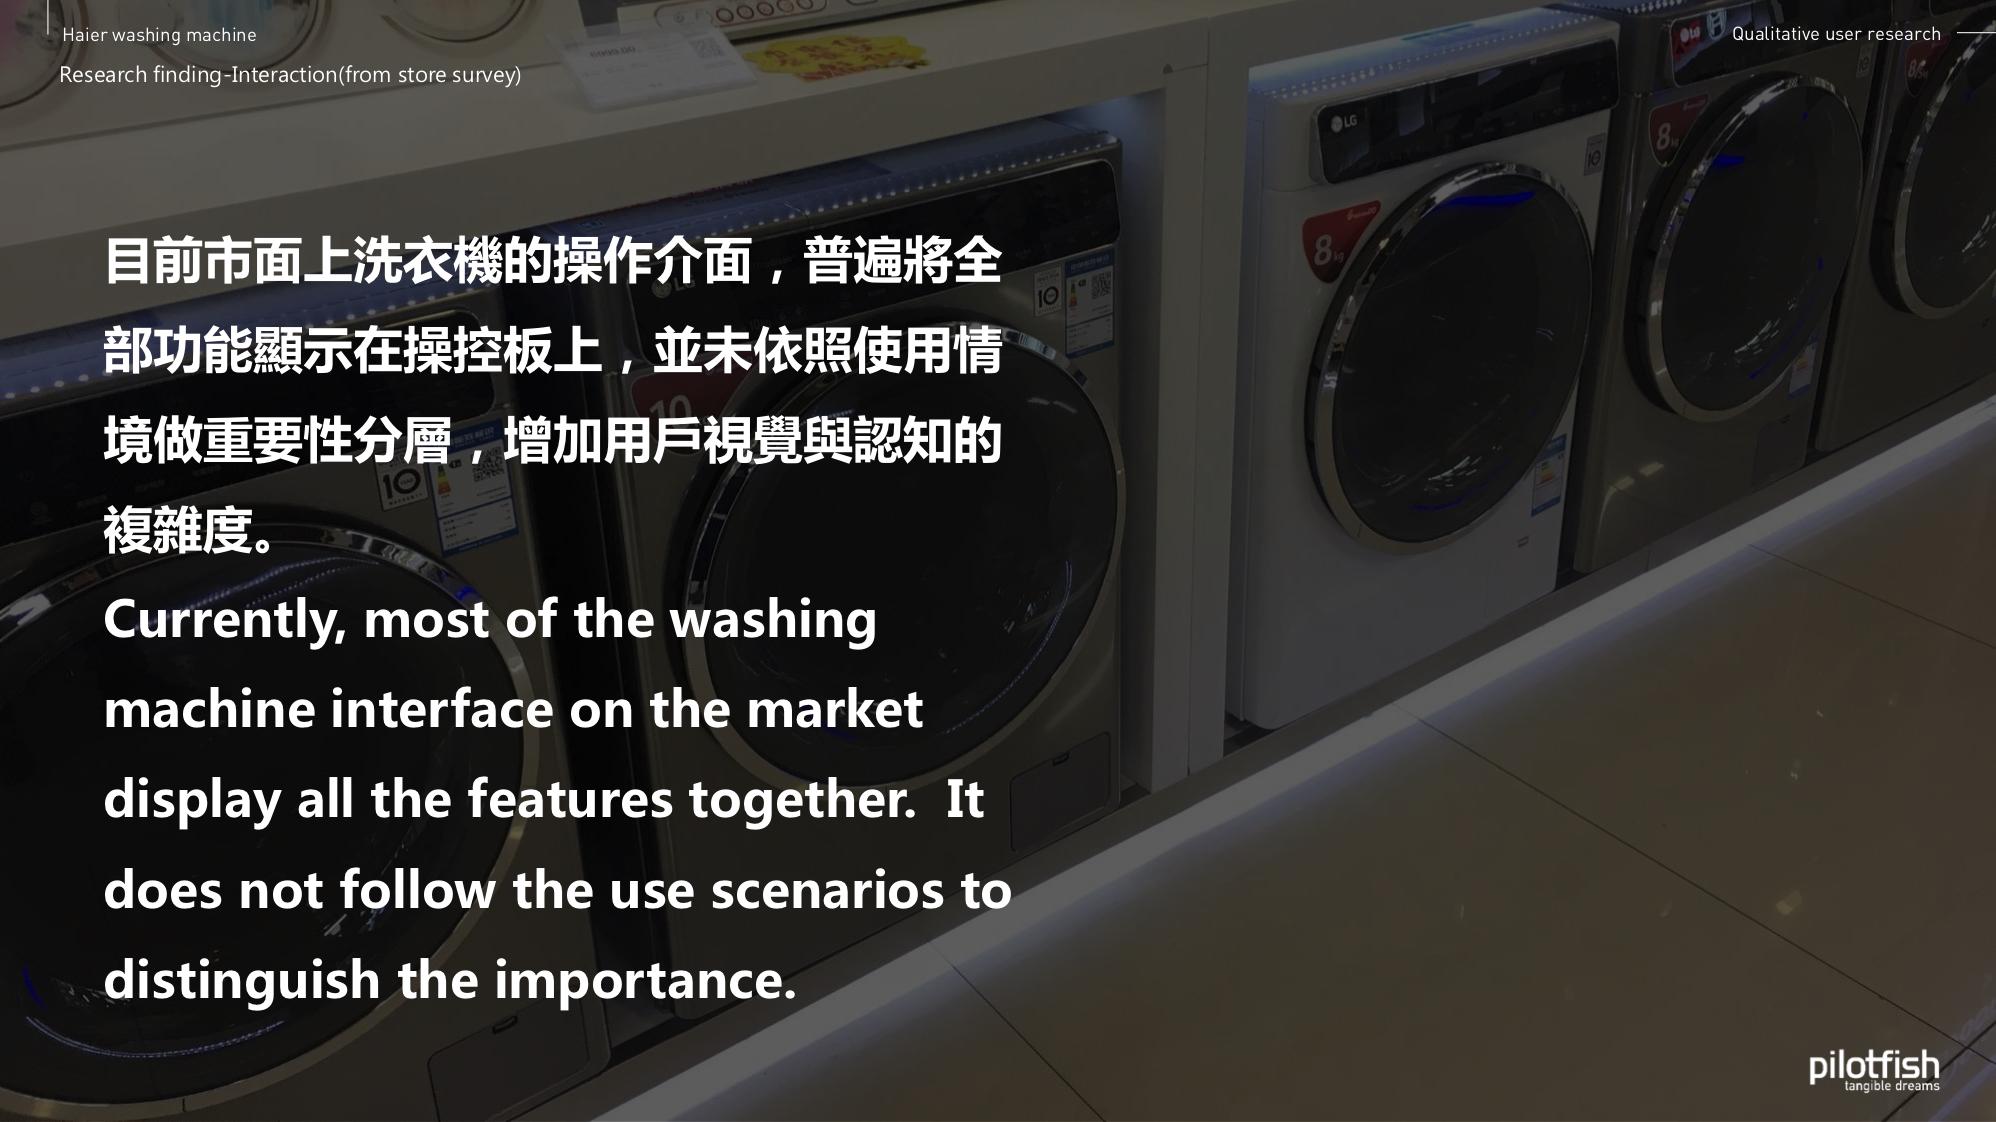 20170727_Haier_washing machine innovative UI_P0 presentation_V4_Eng_27.jpg